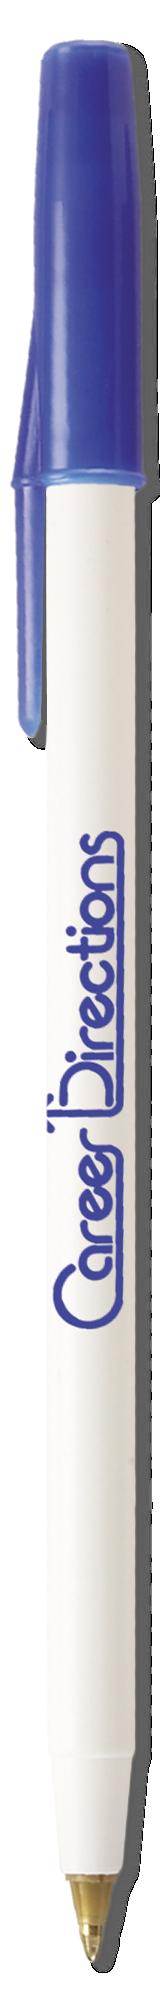 Budget Stick Pen